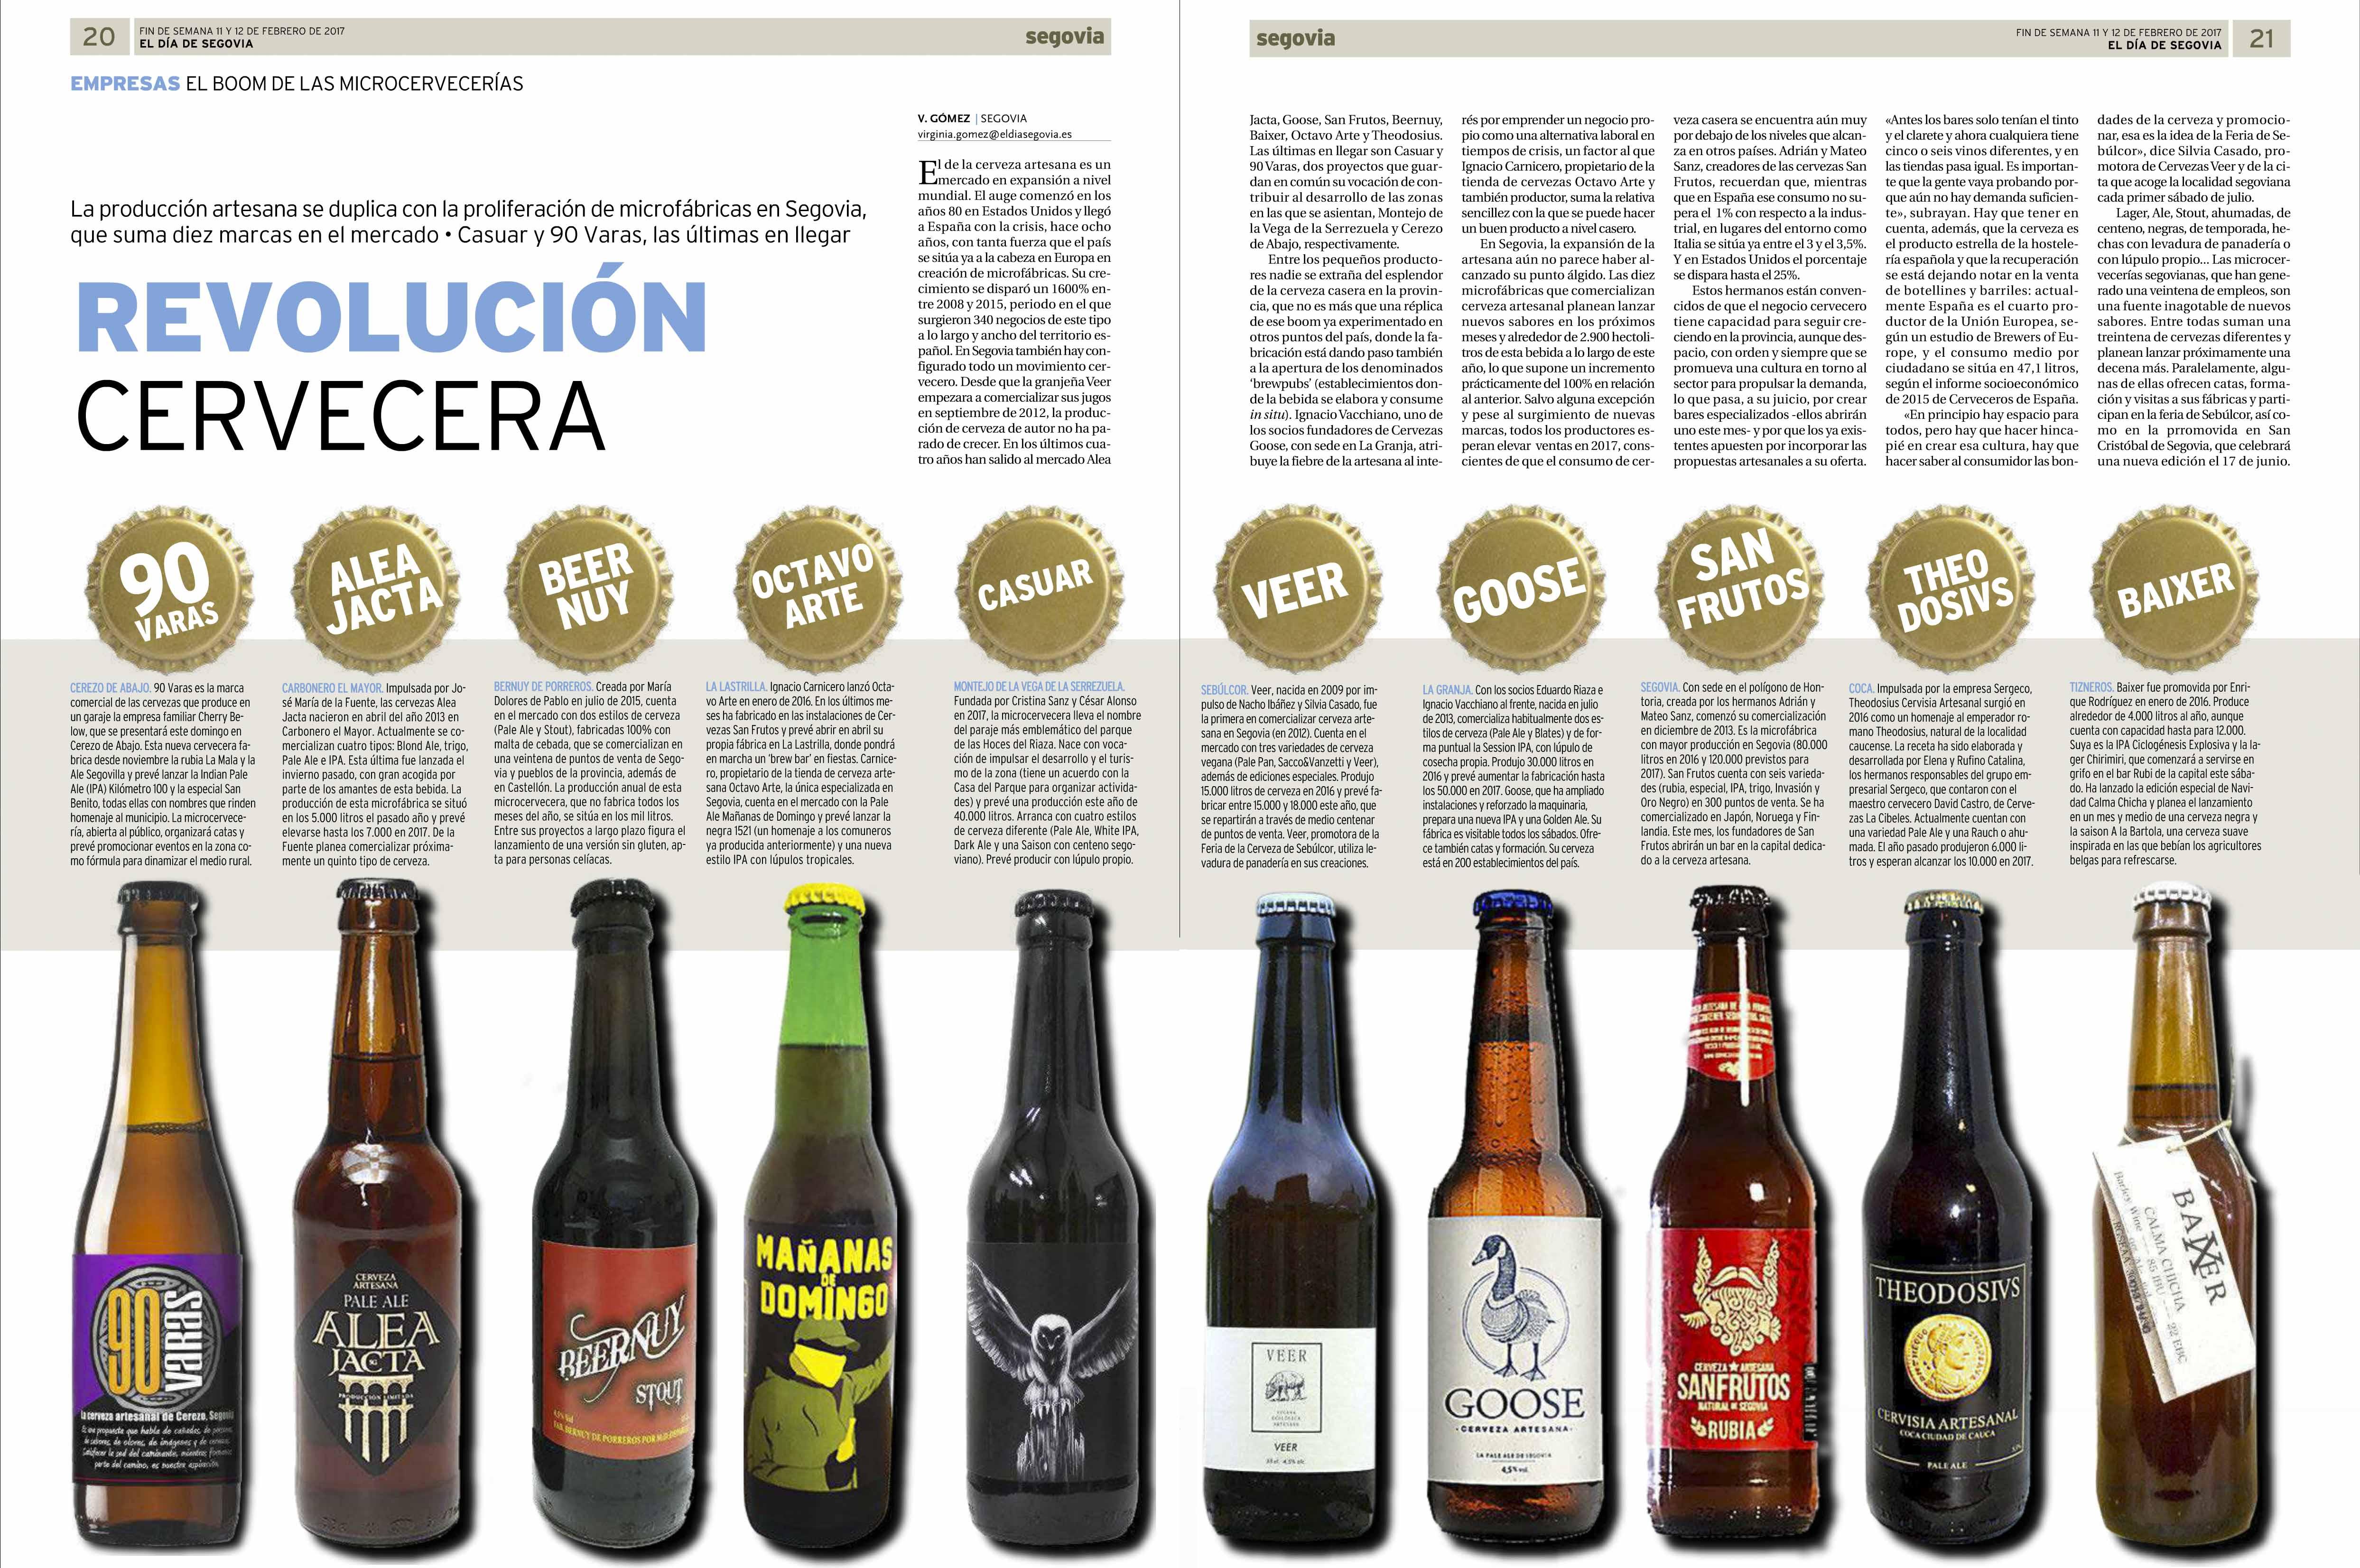 El_dia_de_Segovia_170211_Cervezas_Alea_Jacta_Revolucion_Cervecera_2paginas